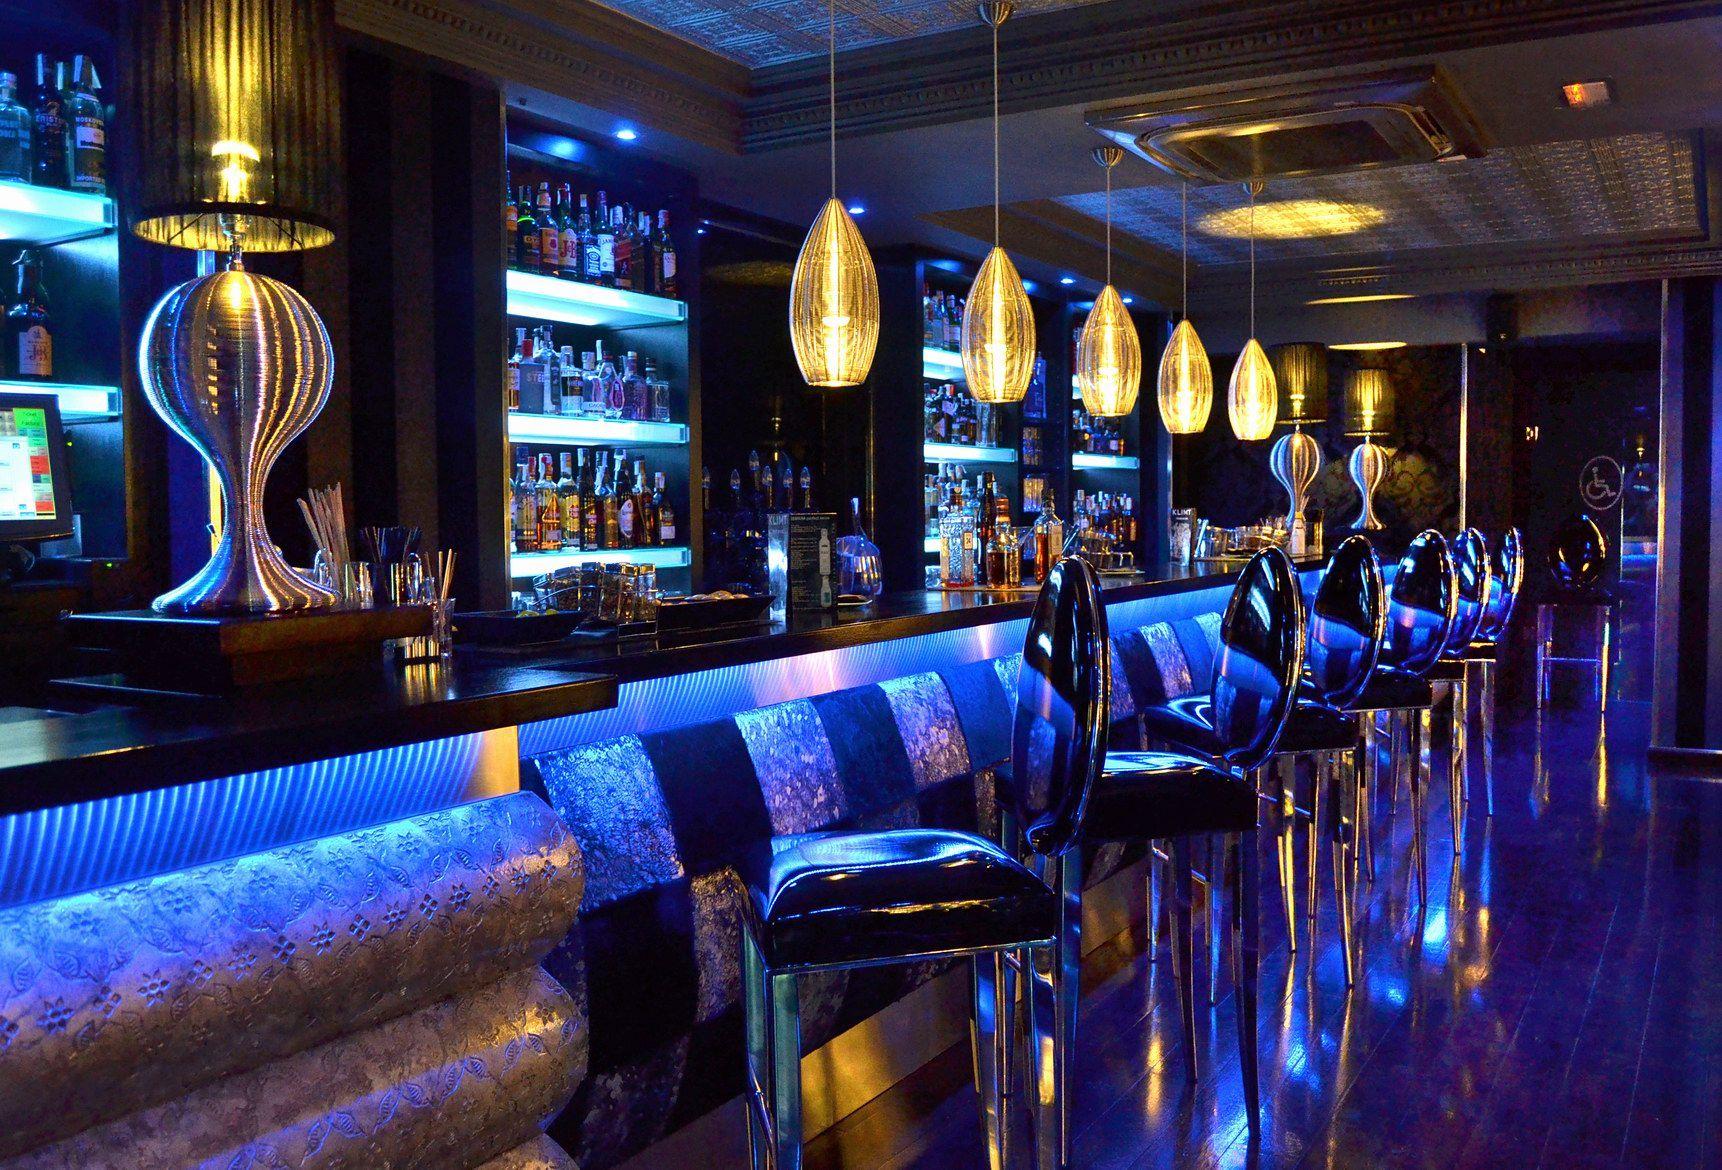 Newwd decoracion de bares tematicos klimt madrid - Decoracion de pub ...